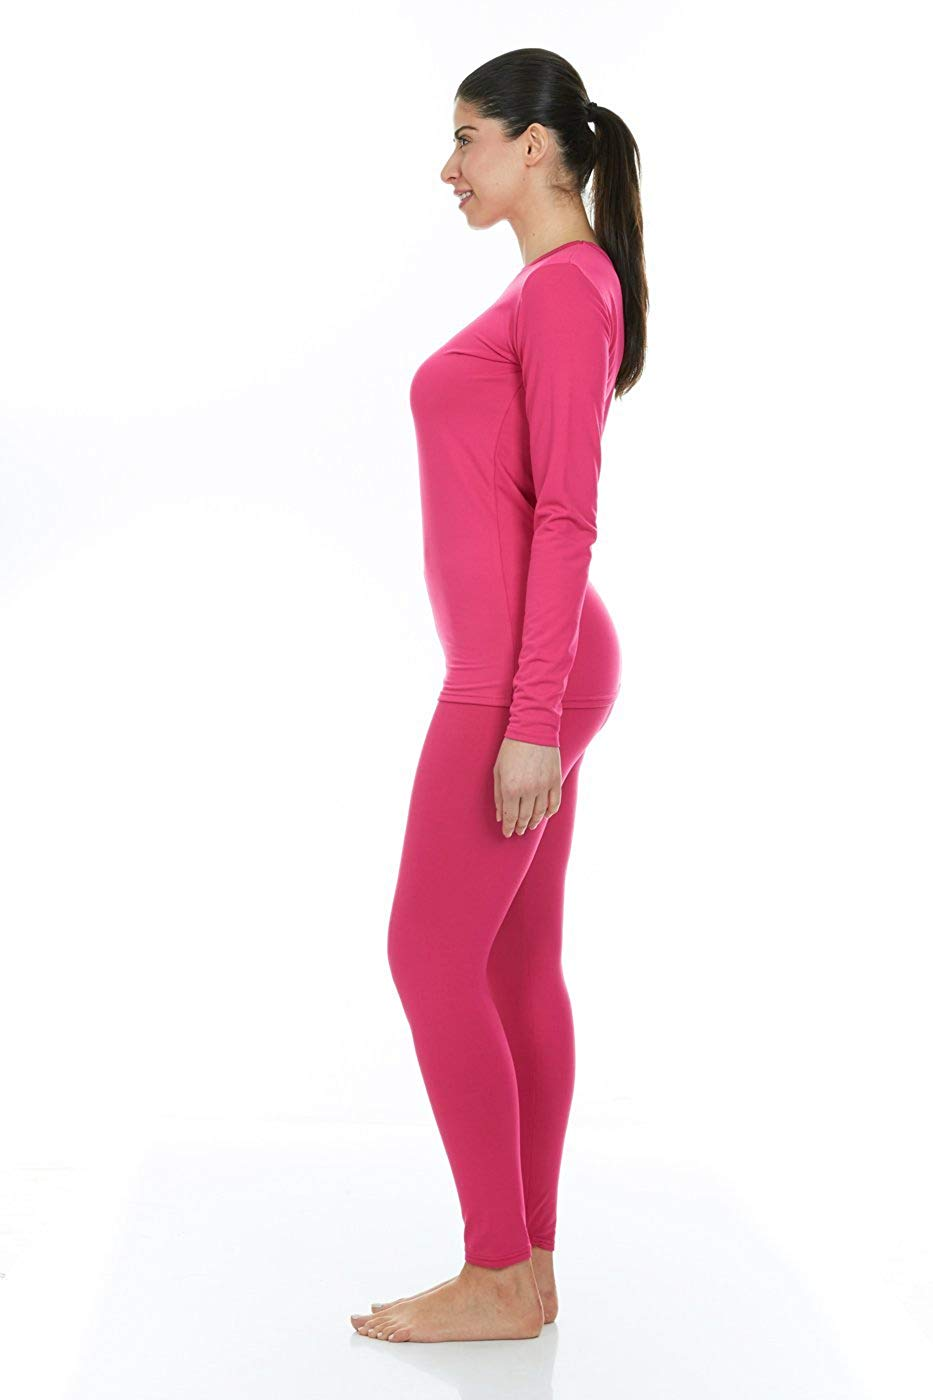 Women s Ultra Soft Thermal Underwear Long Johns Set with Fleece Lined